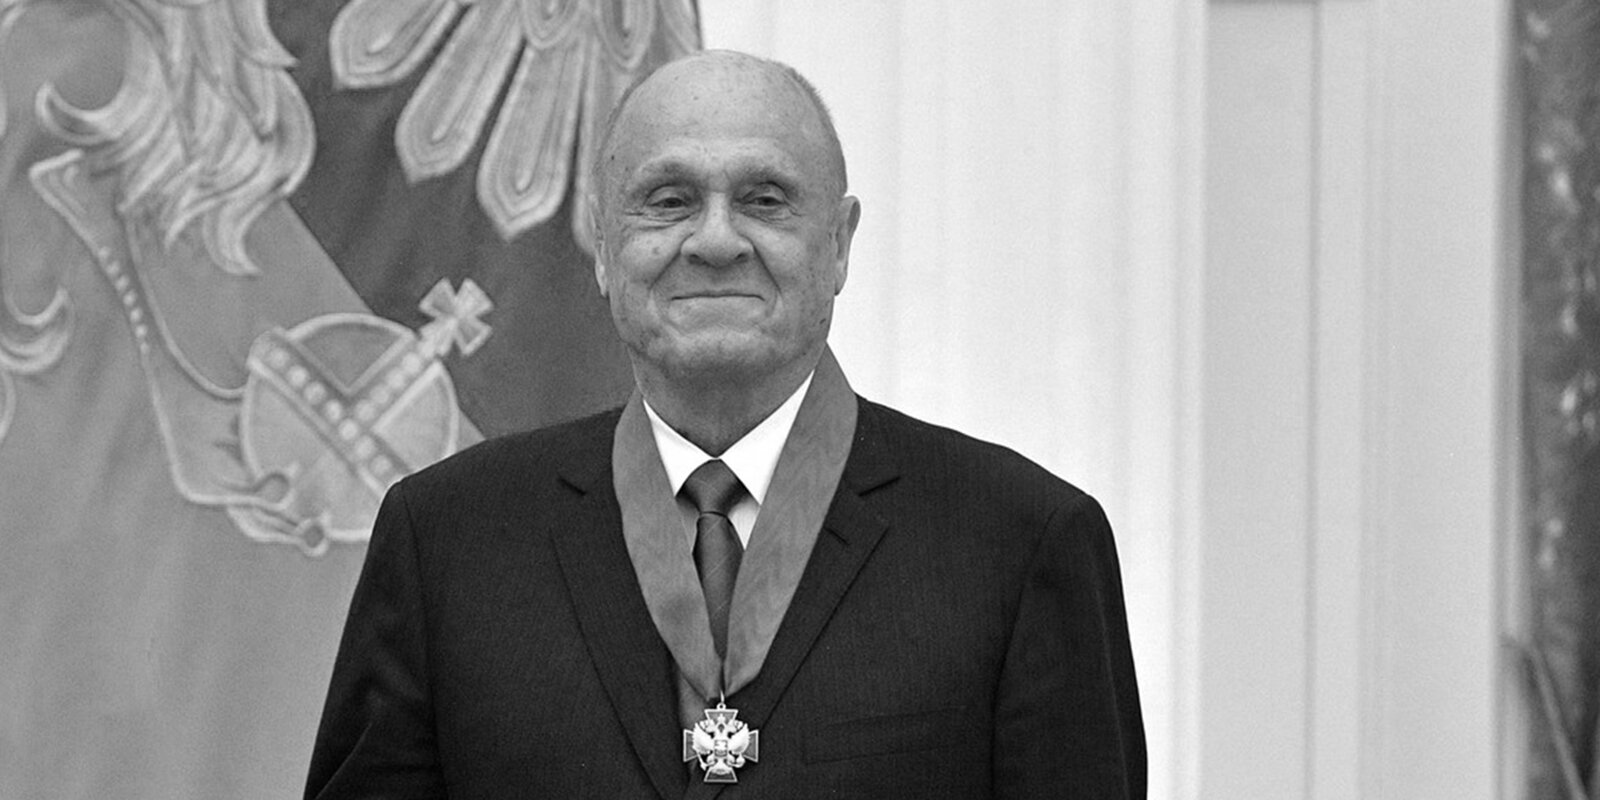 Пресс-служба Президента Российской Федерации